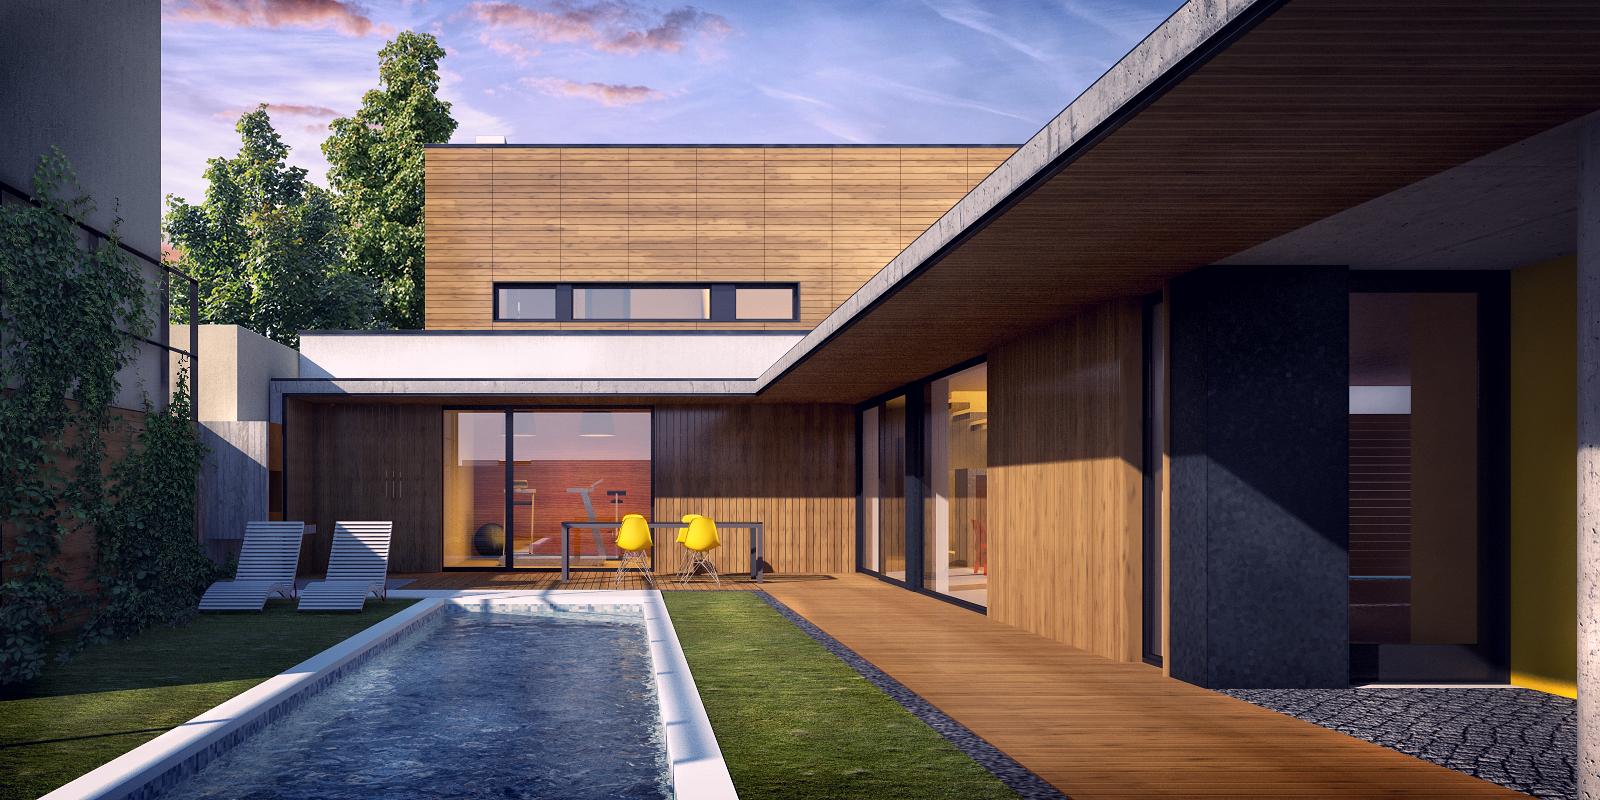 Casa Frantu - Imagine piscina